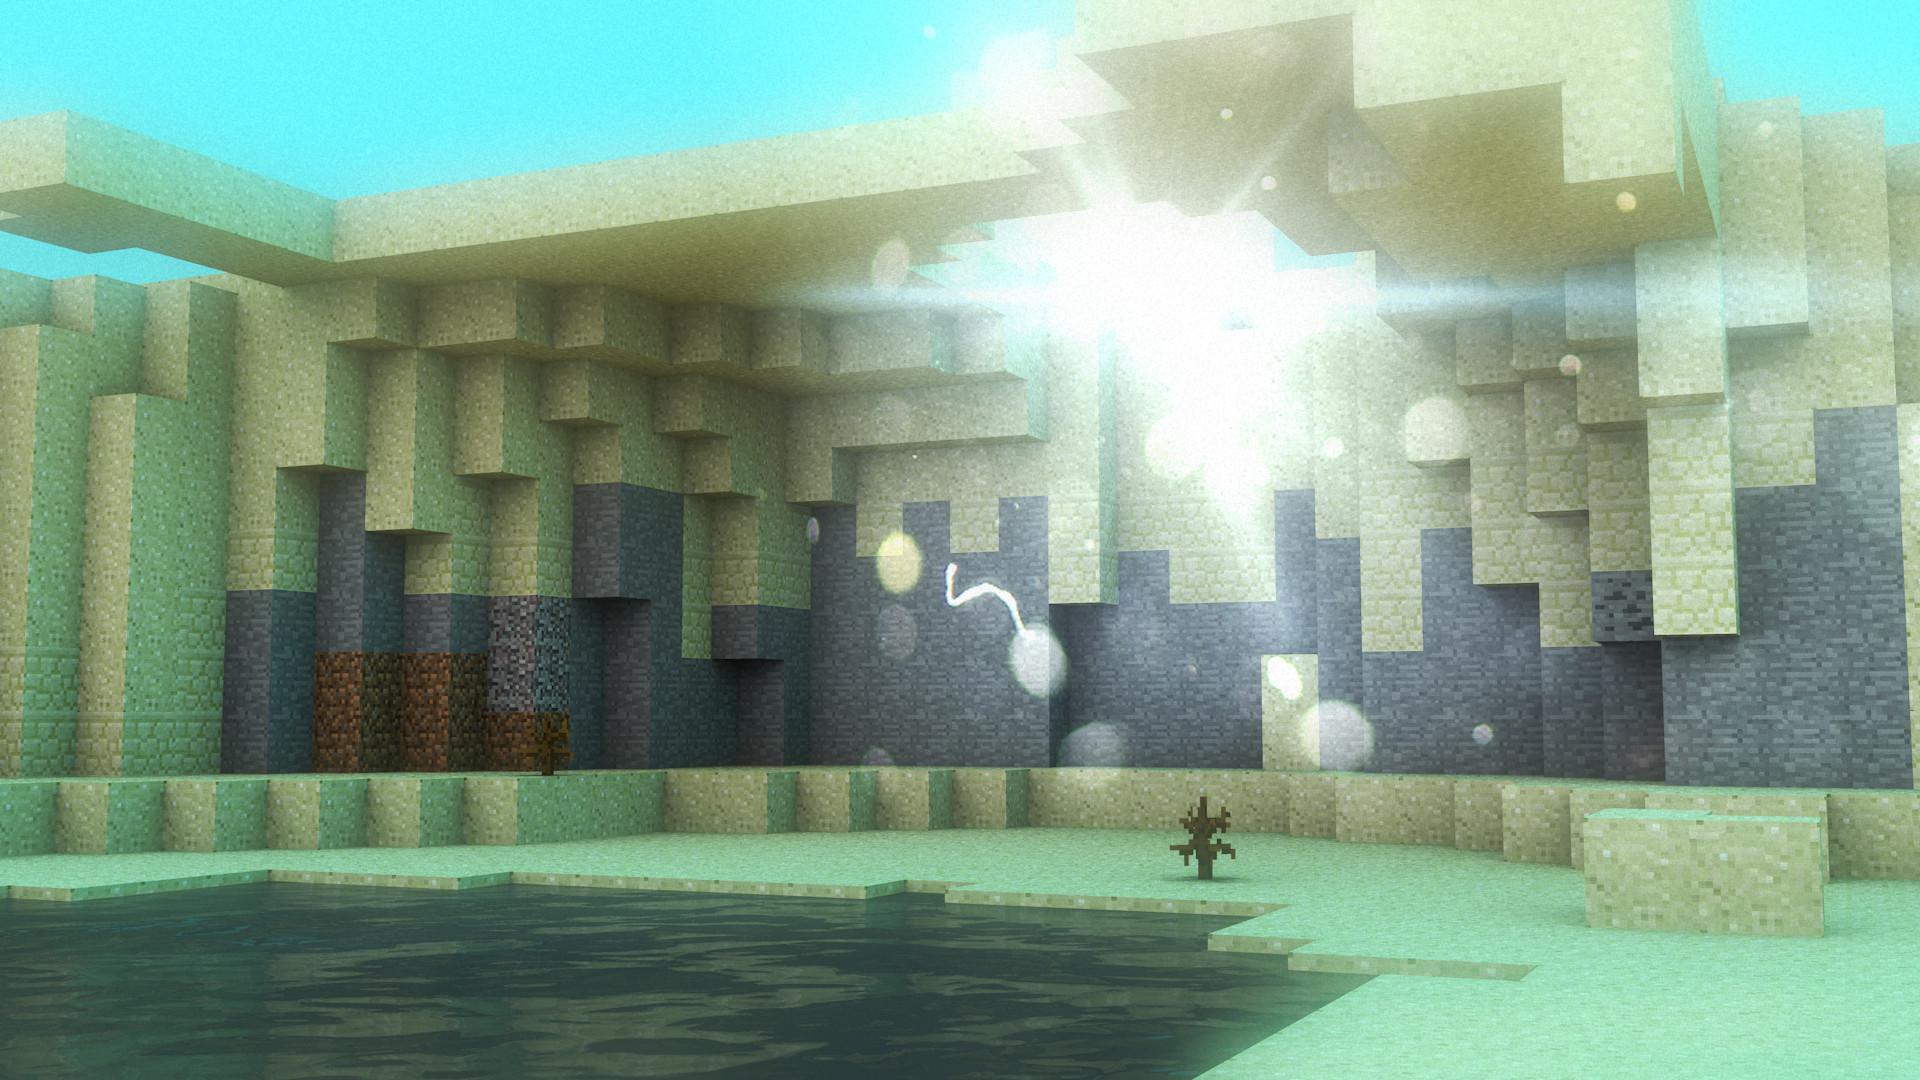 Beautiful Wallpaper Minecraft Square - cinema_4d____minecraft_wallpaper_iii_by_smokeyoriginalhd-d4pu25q  Pic_668210.jpg